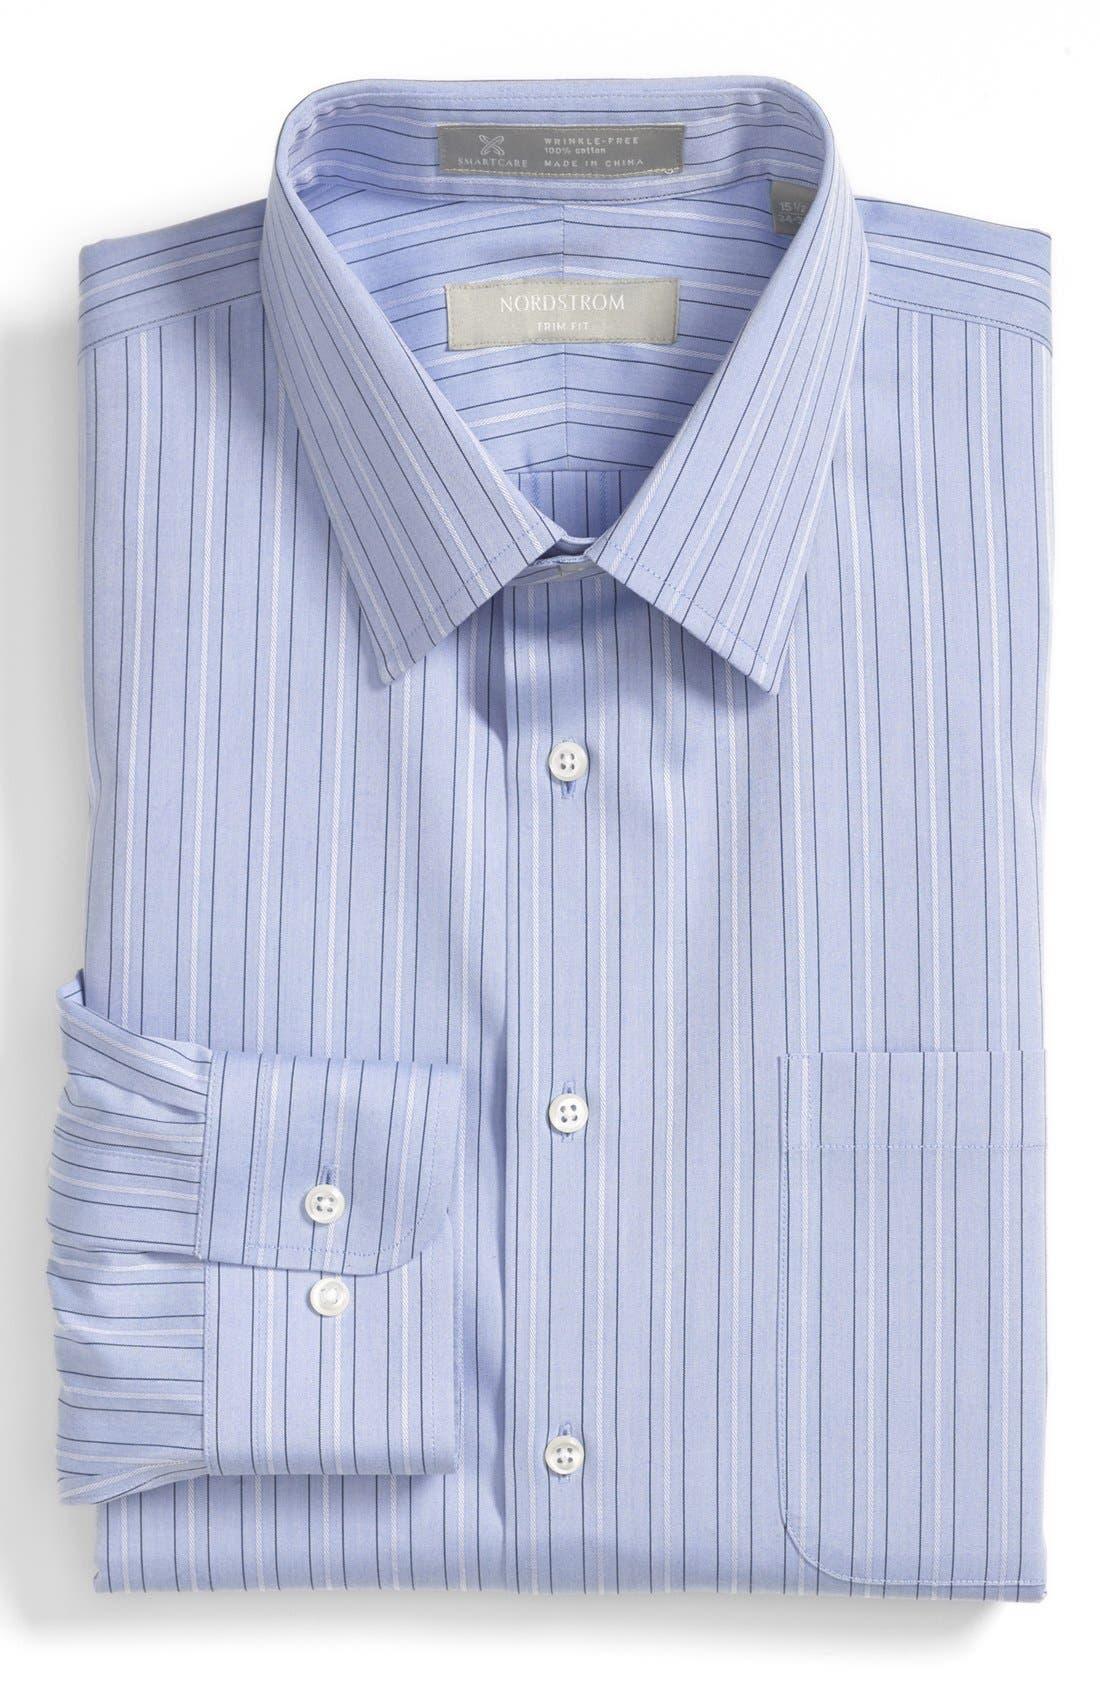 Main Image - Nordstrom Smartcare™ Trim Fit Stripe Non-Iron Dress Shirt